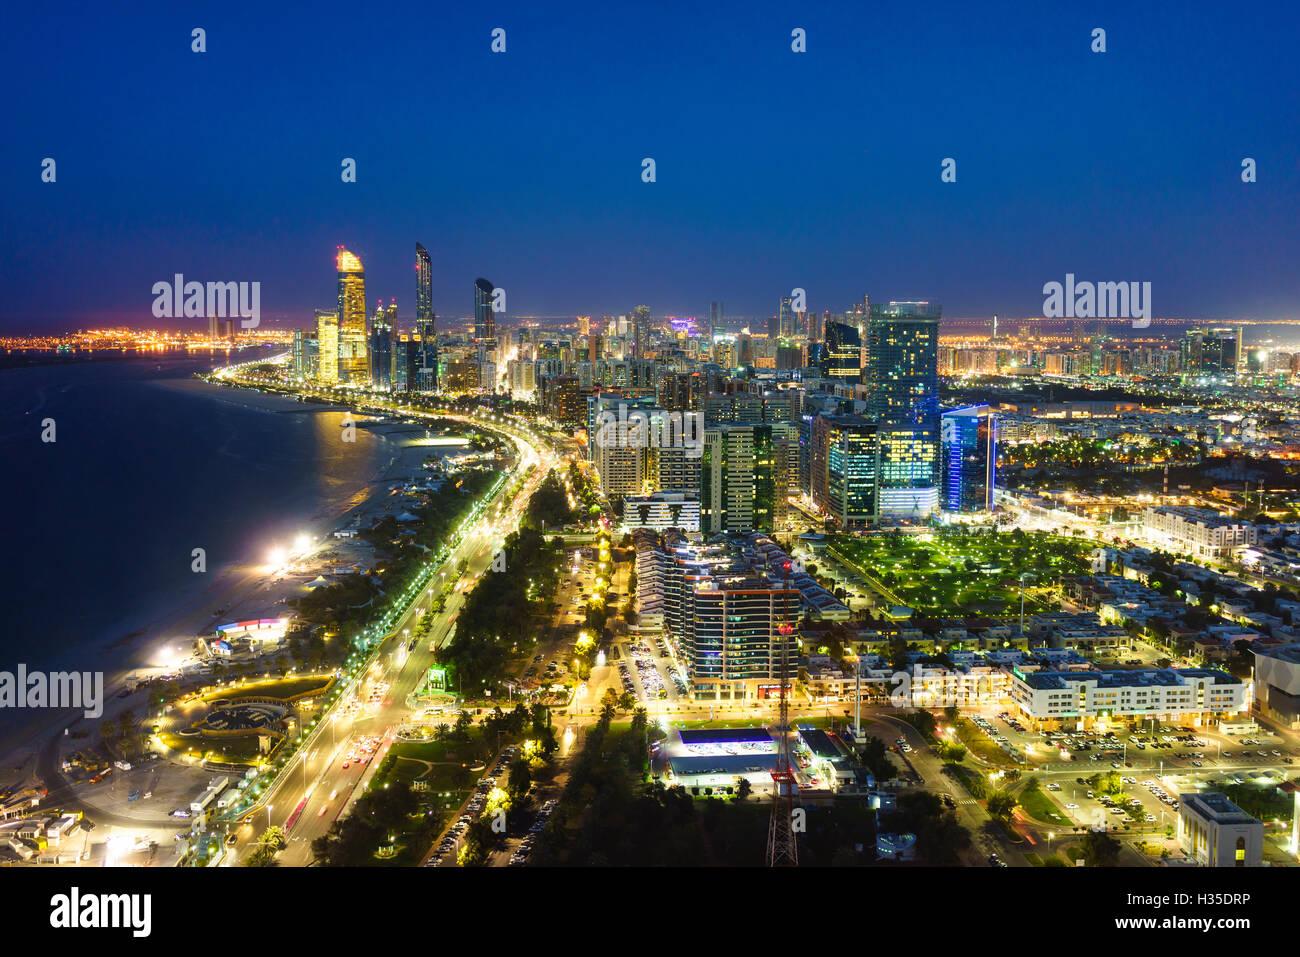 Skyline and Corniche, Al Markaziyah district by night, Abu Dhabi, United Arab Emirates, Middle East - Stock Image